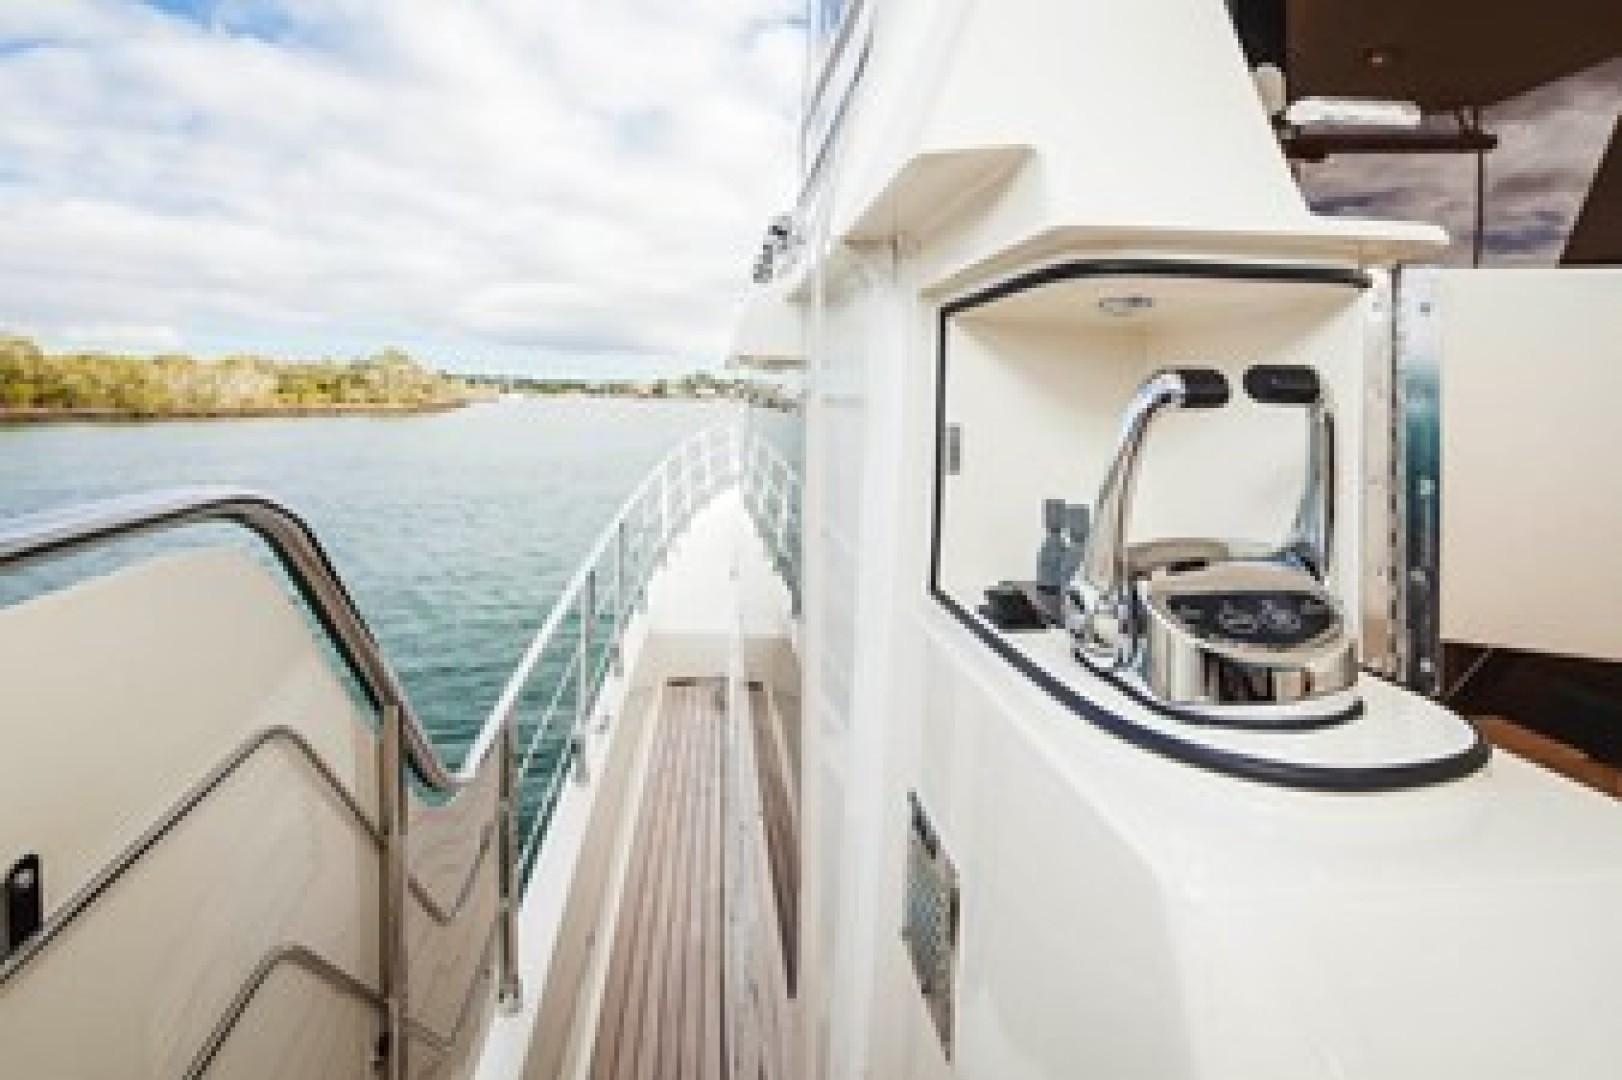 Norseman-50 Free Ocean Yachtfish 2020 -FL-Florida-United States-1500438 | Thumbnail